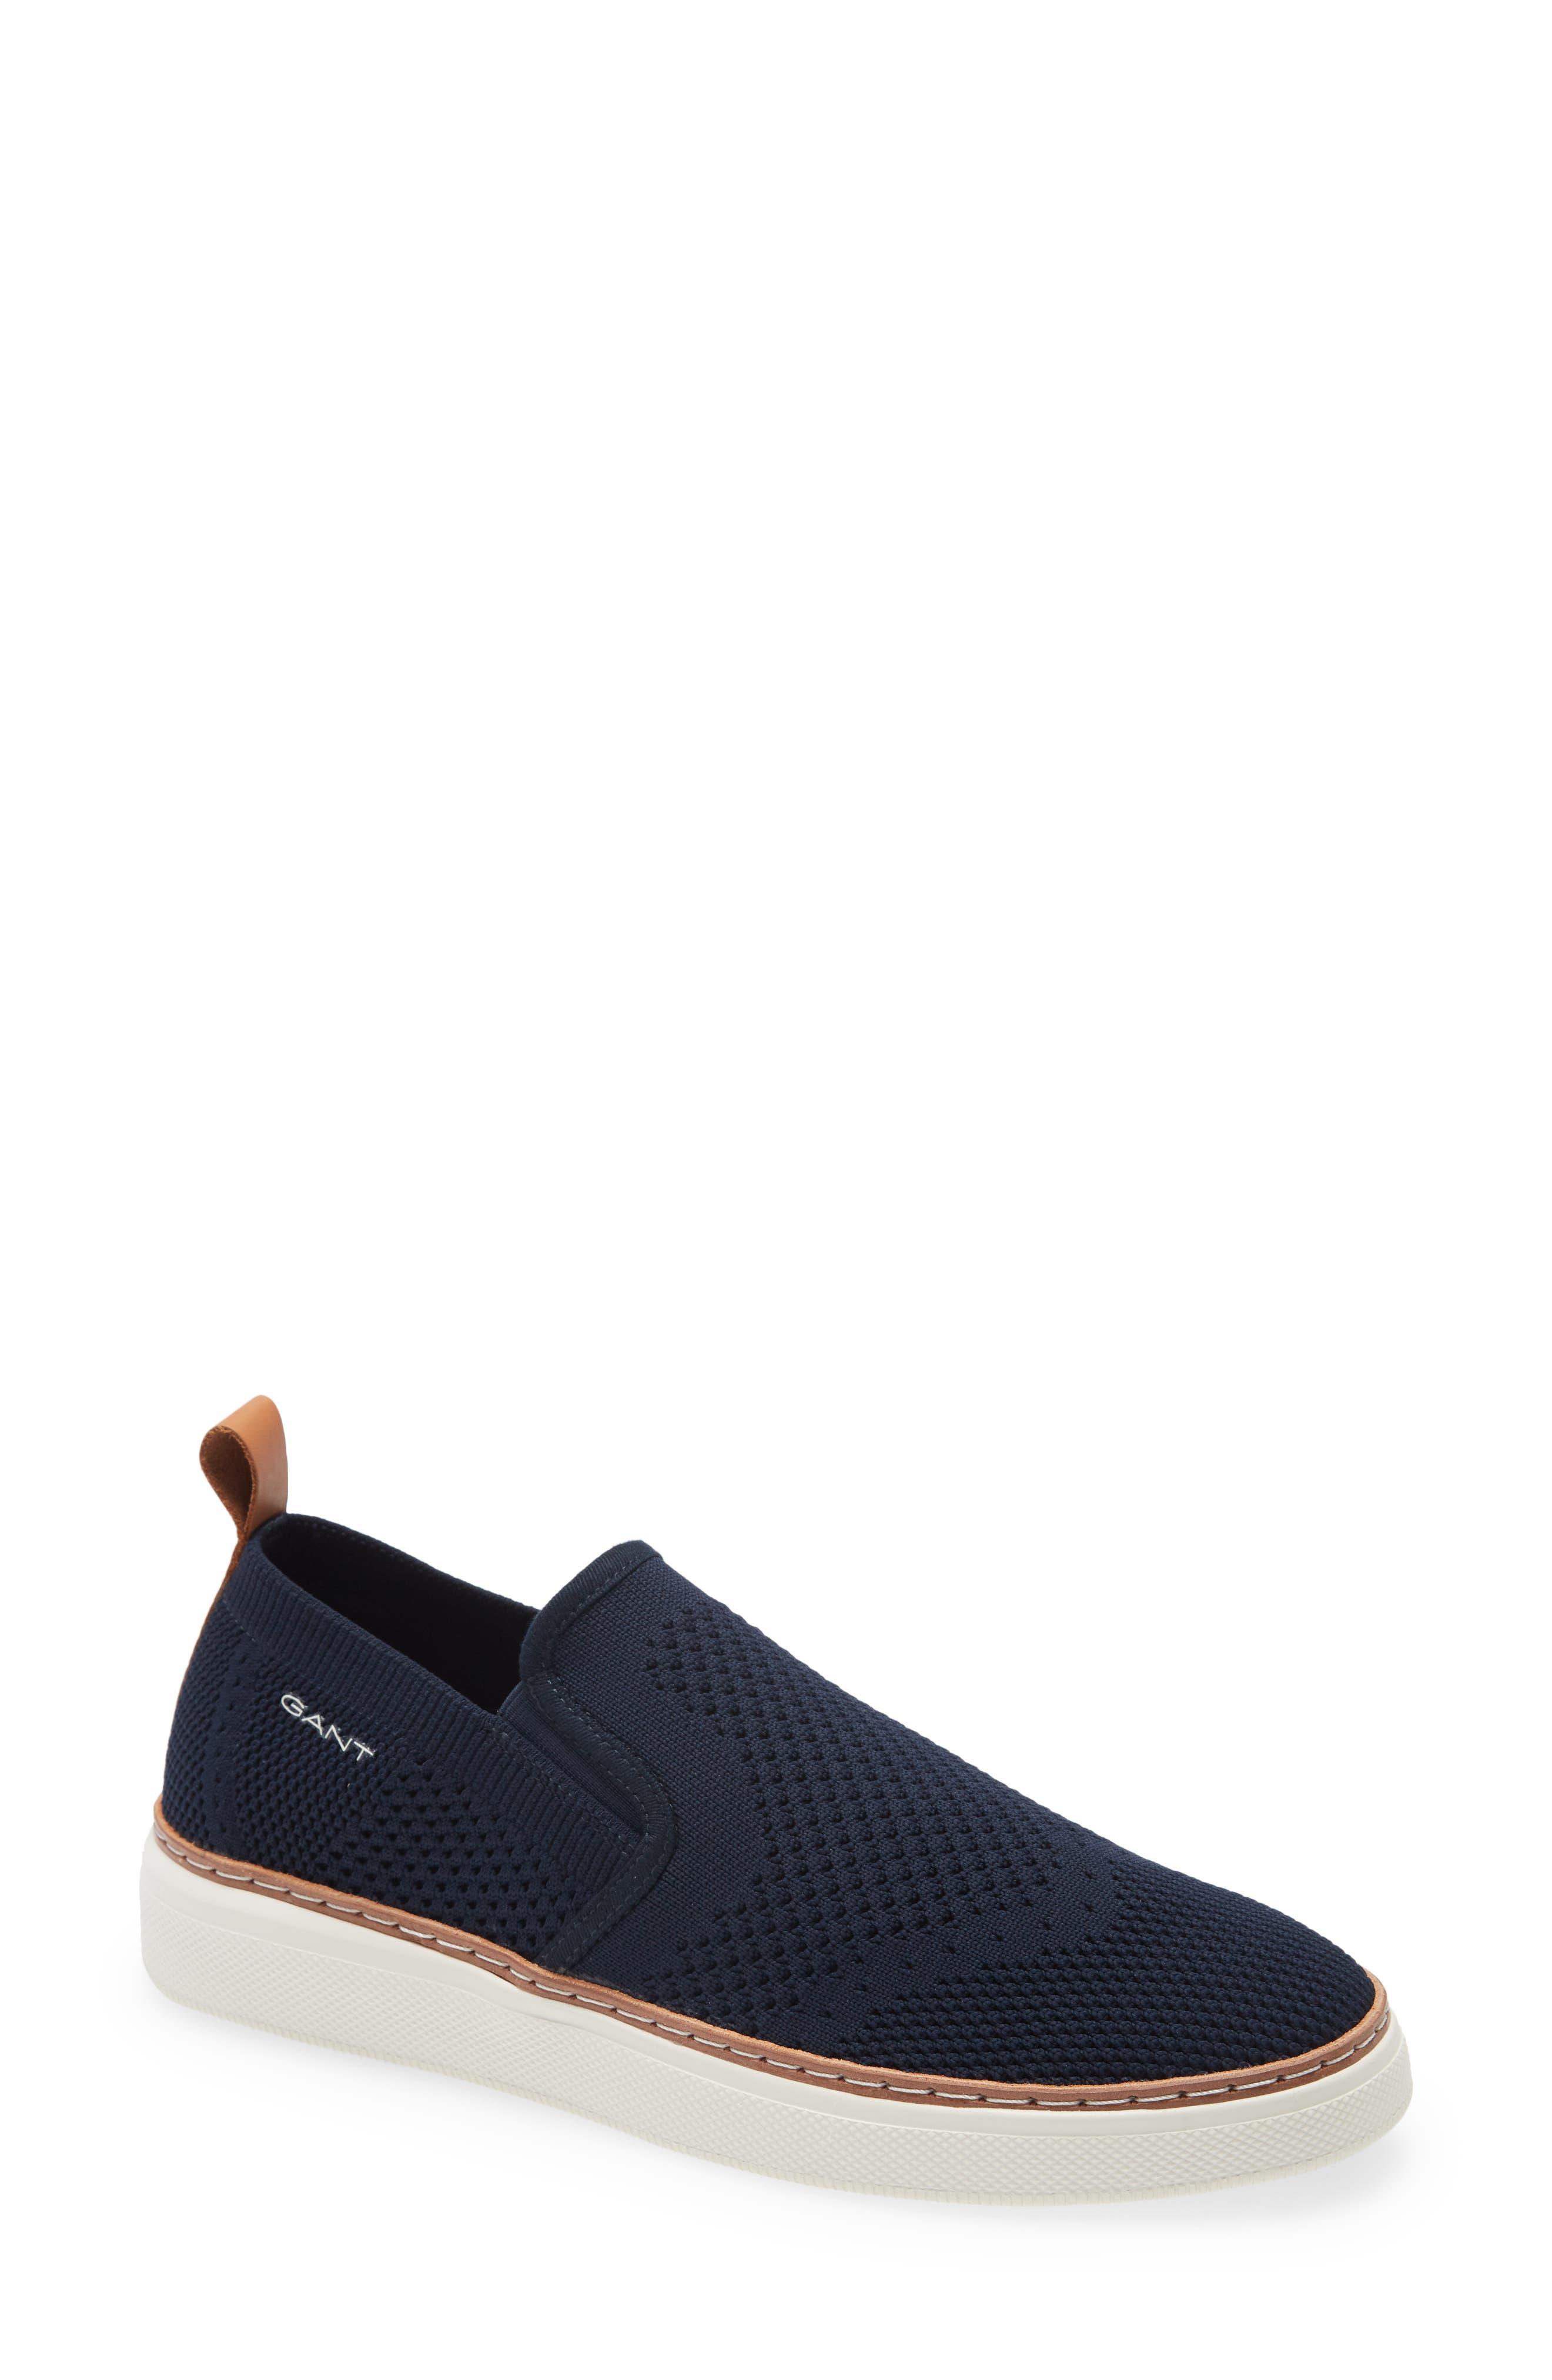 San Prep Slip-On Sneaker